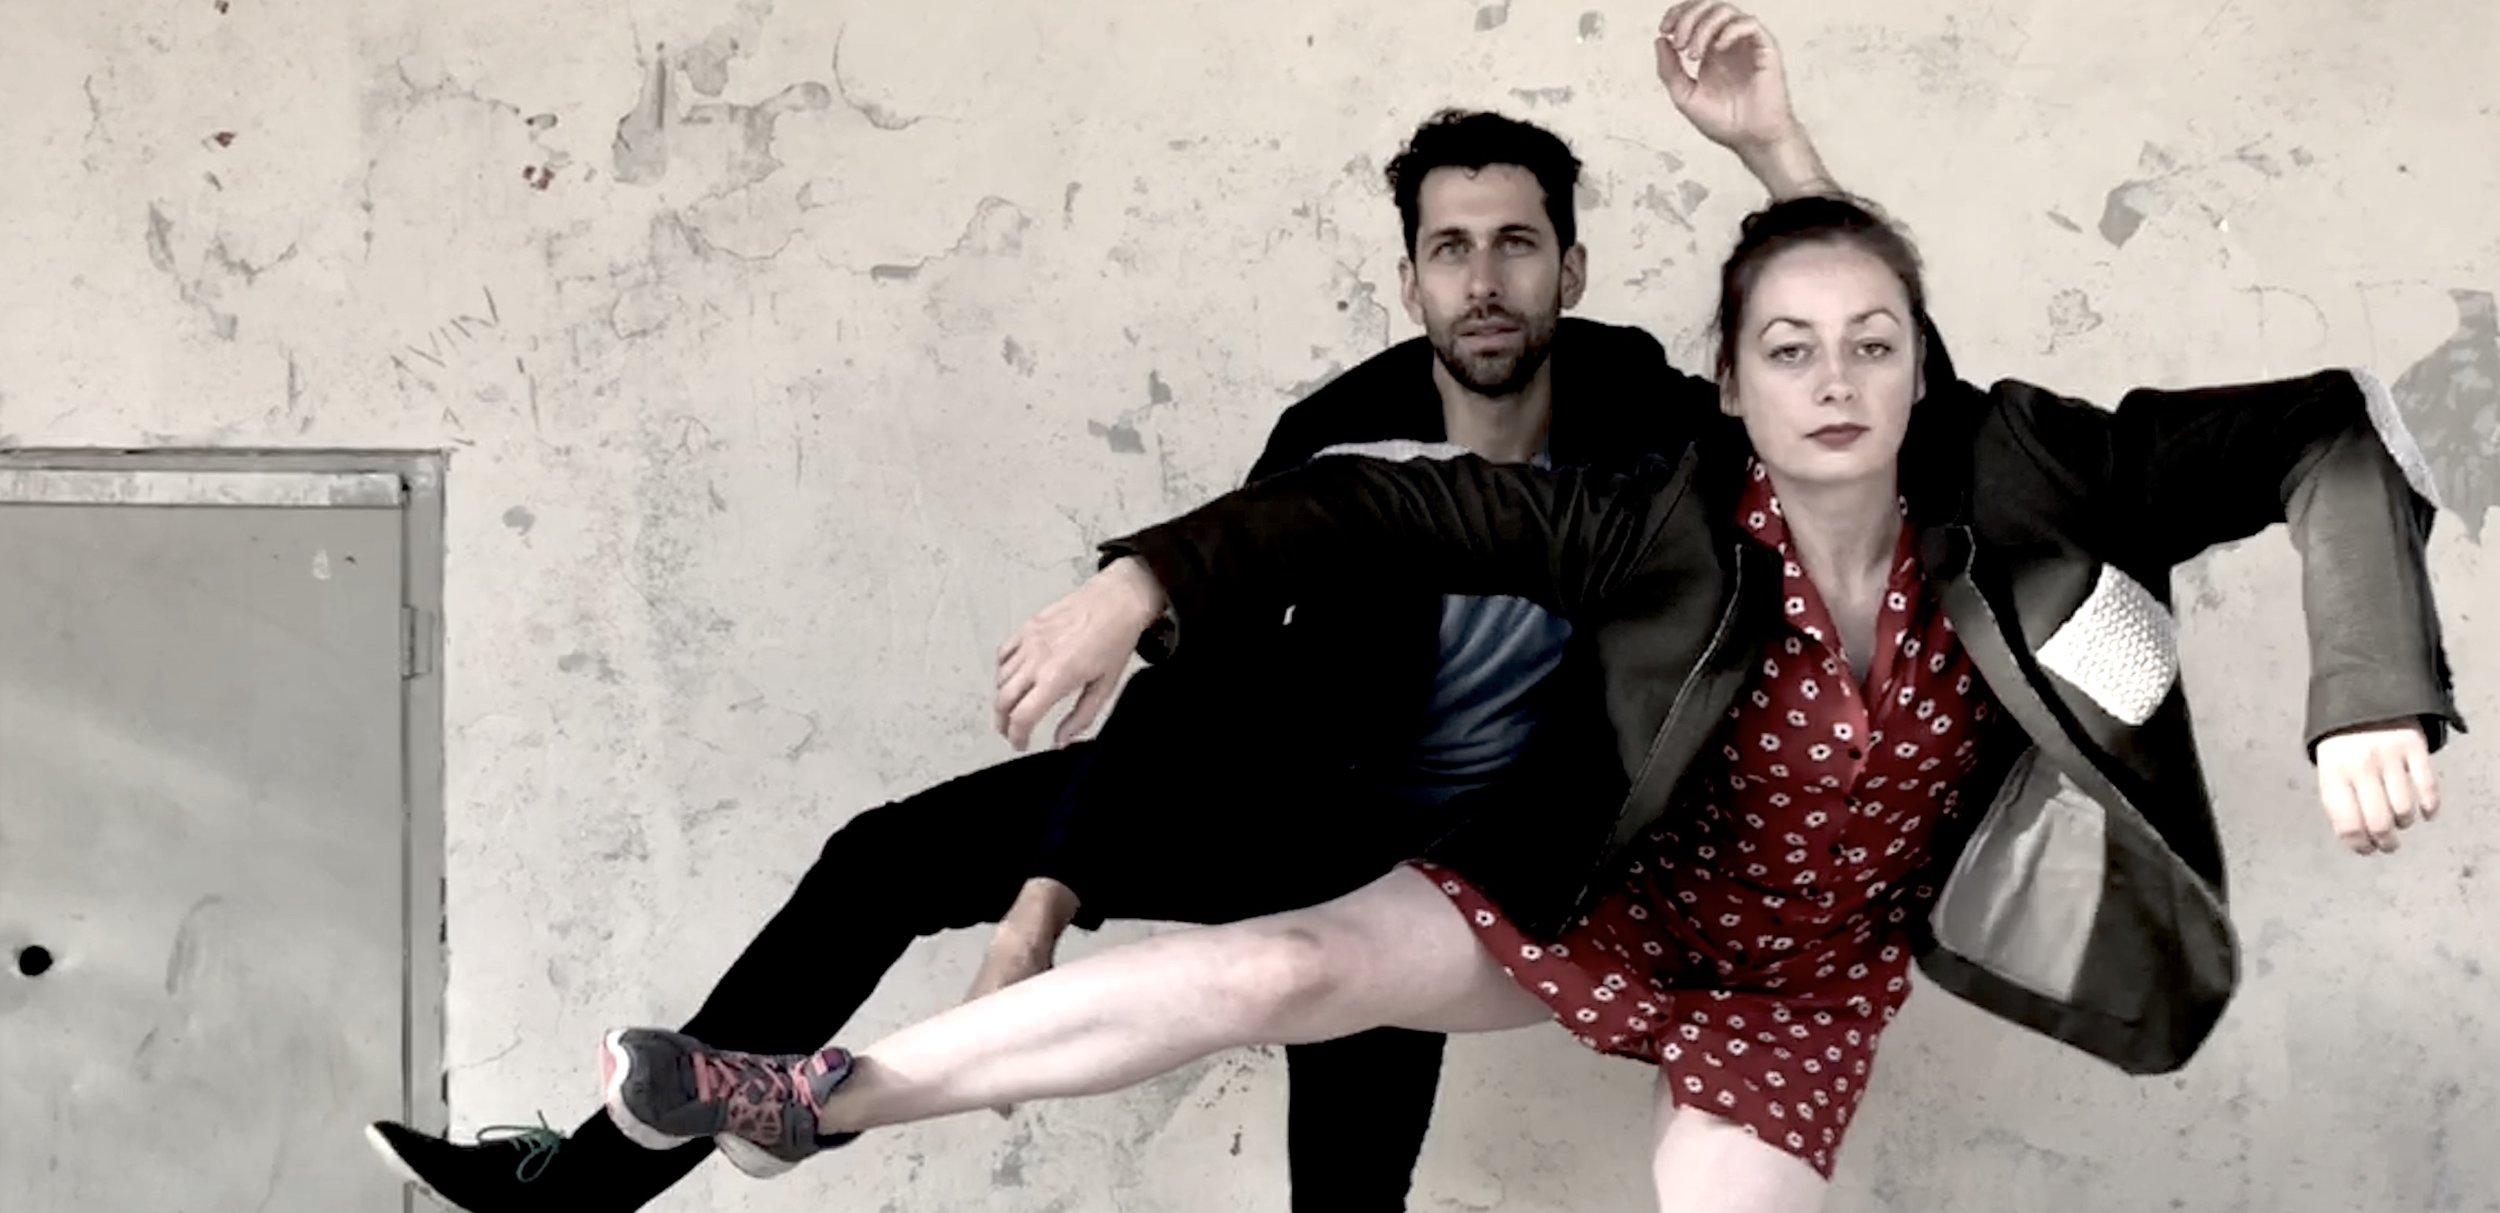 dance-theatre noir - Glasgow & Edinburgh 2019a dance-theatre collaboration with Lucy Ireland loosely inspired by Hitchcock's 'Vertigo'